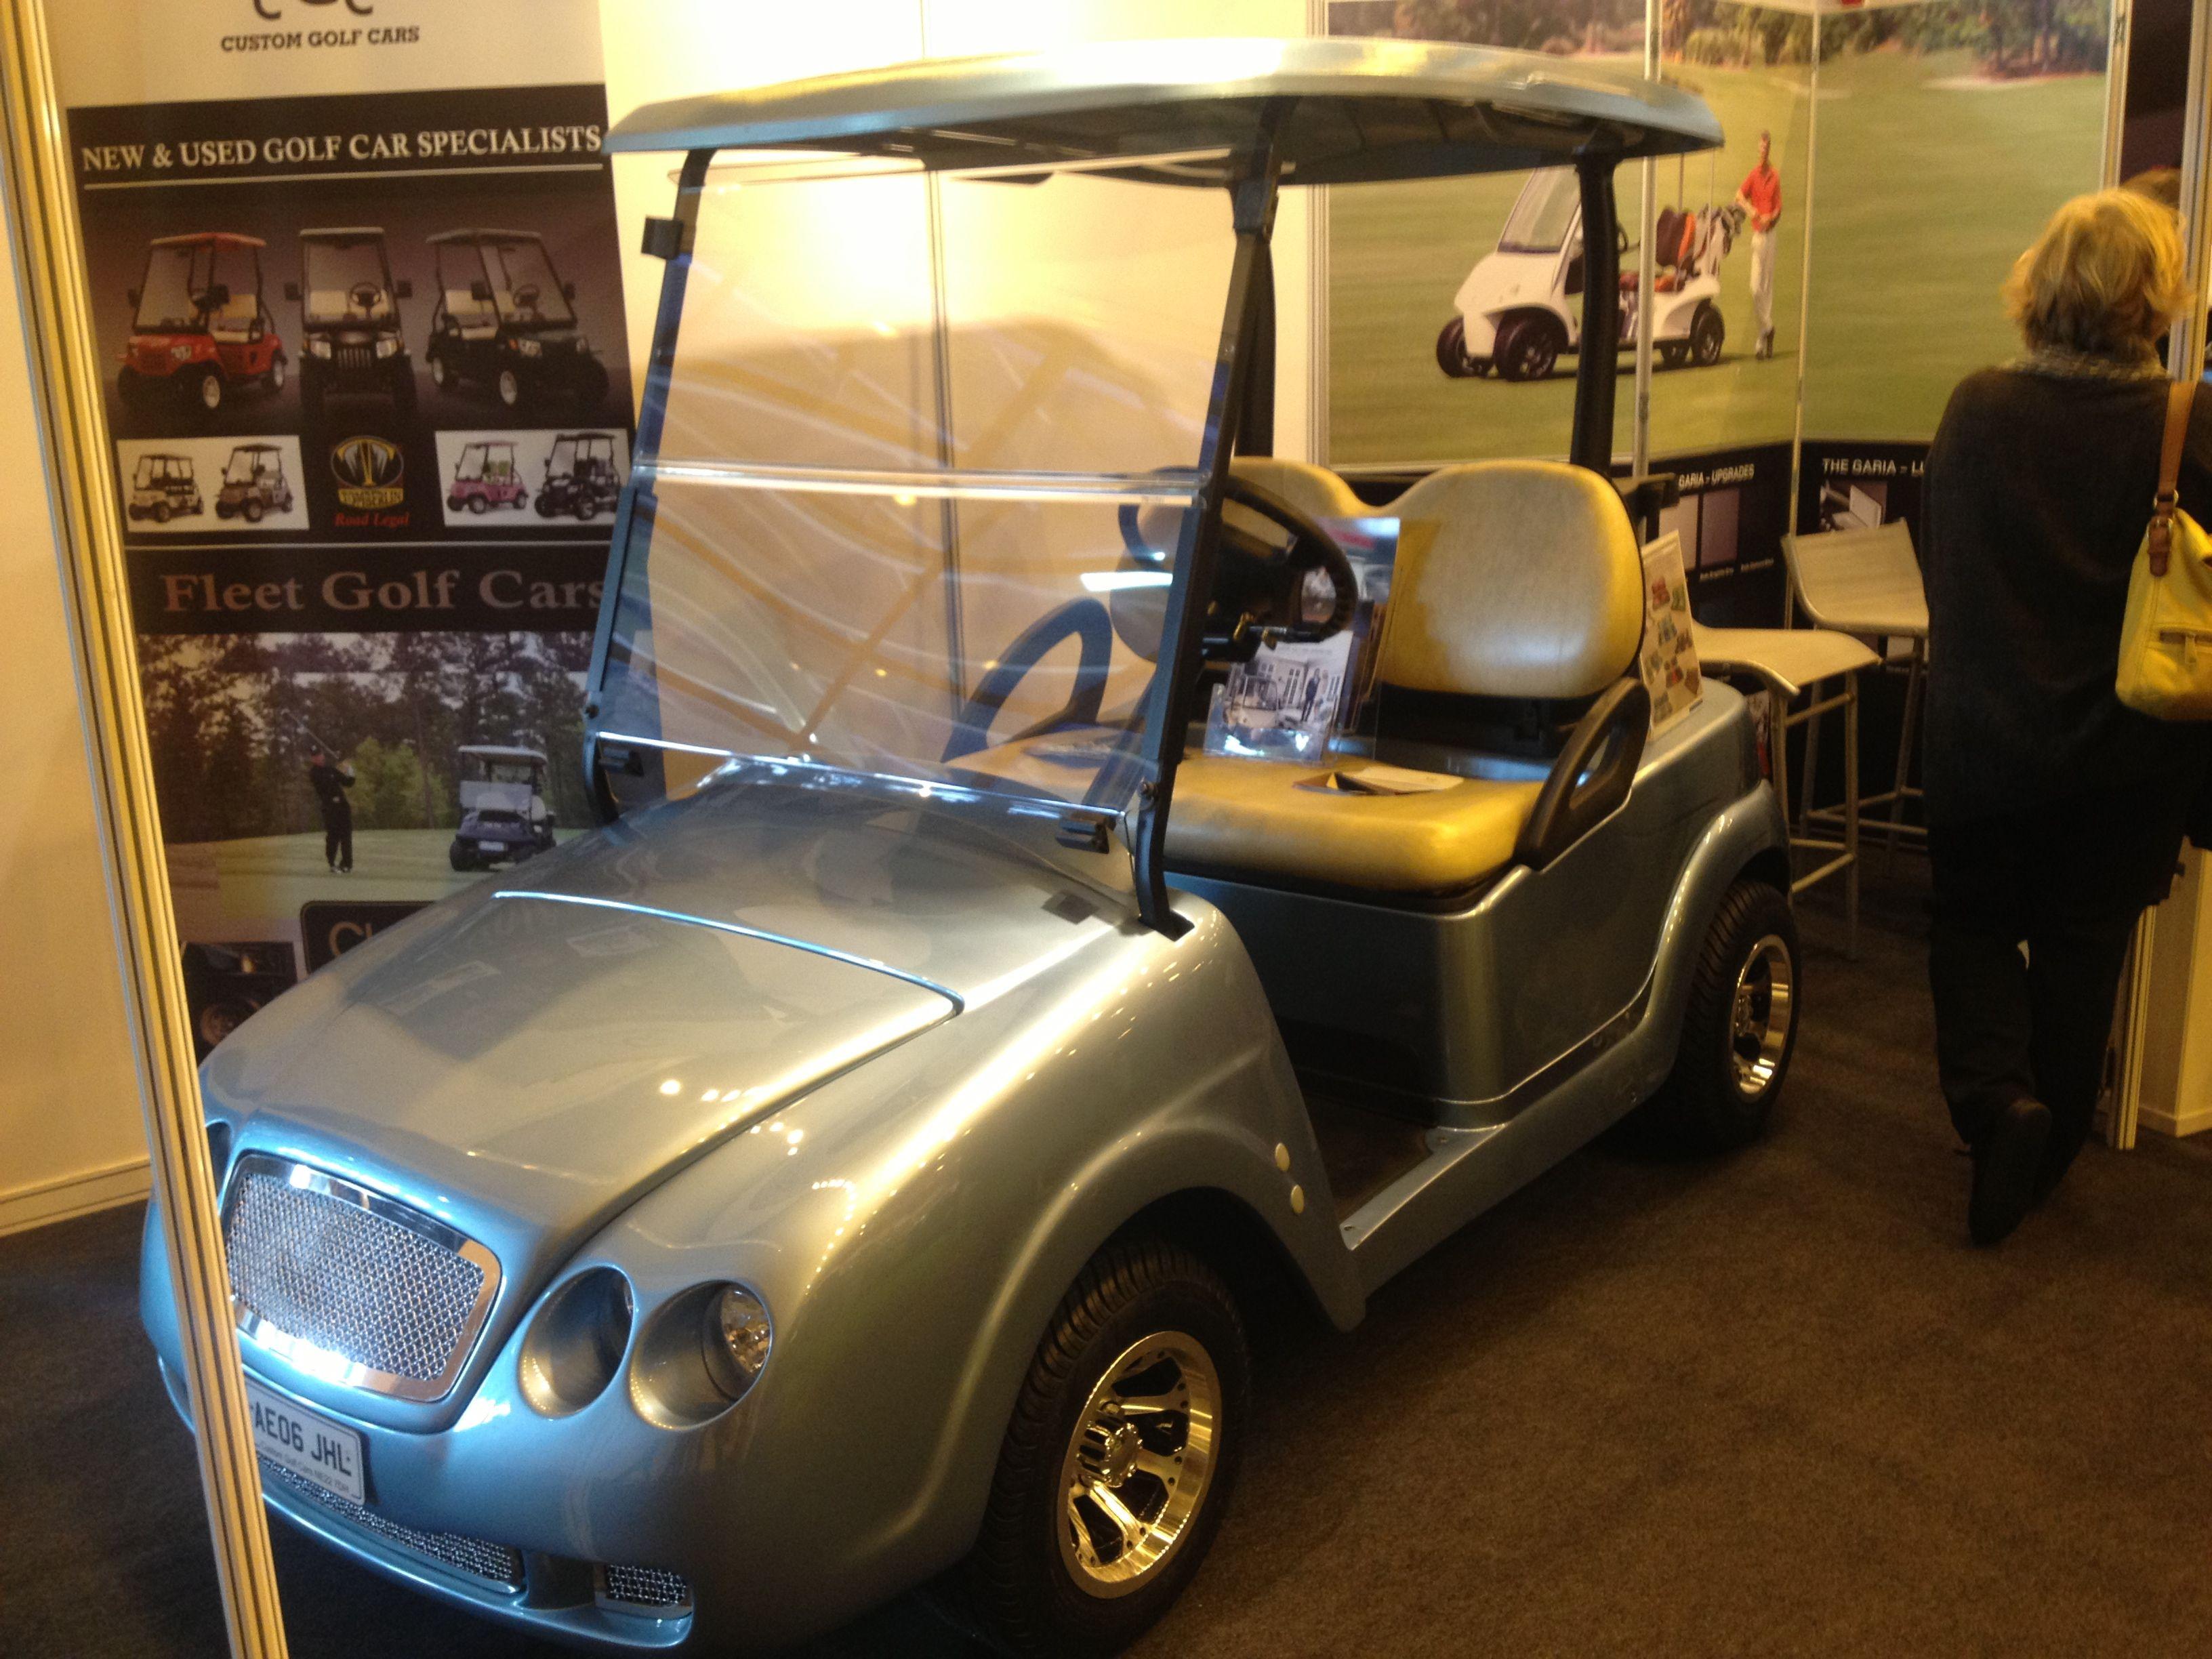 ezgo bentley new valor golf price cart benz for interestingasfuck gray gas img sale ghost mercedes txt